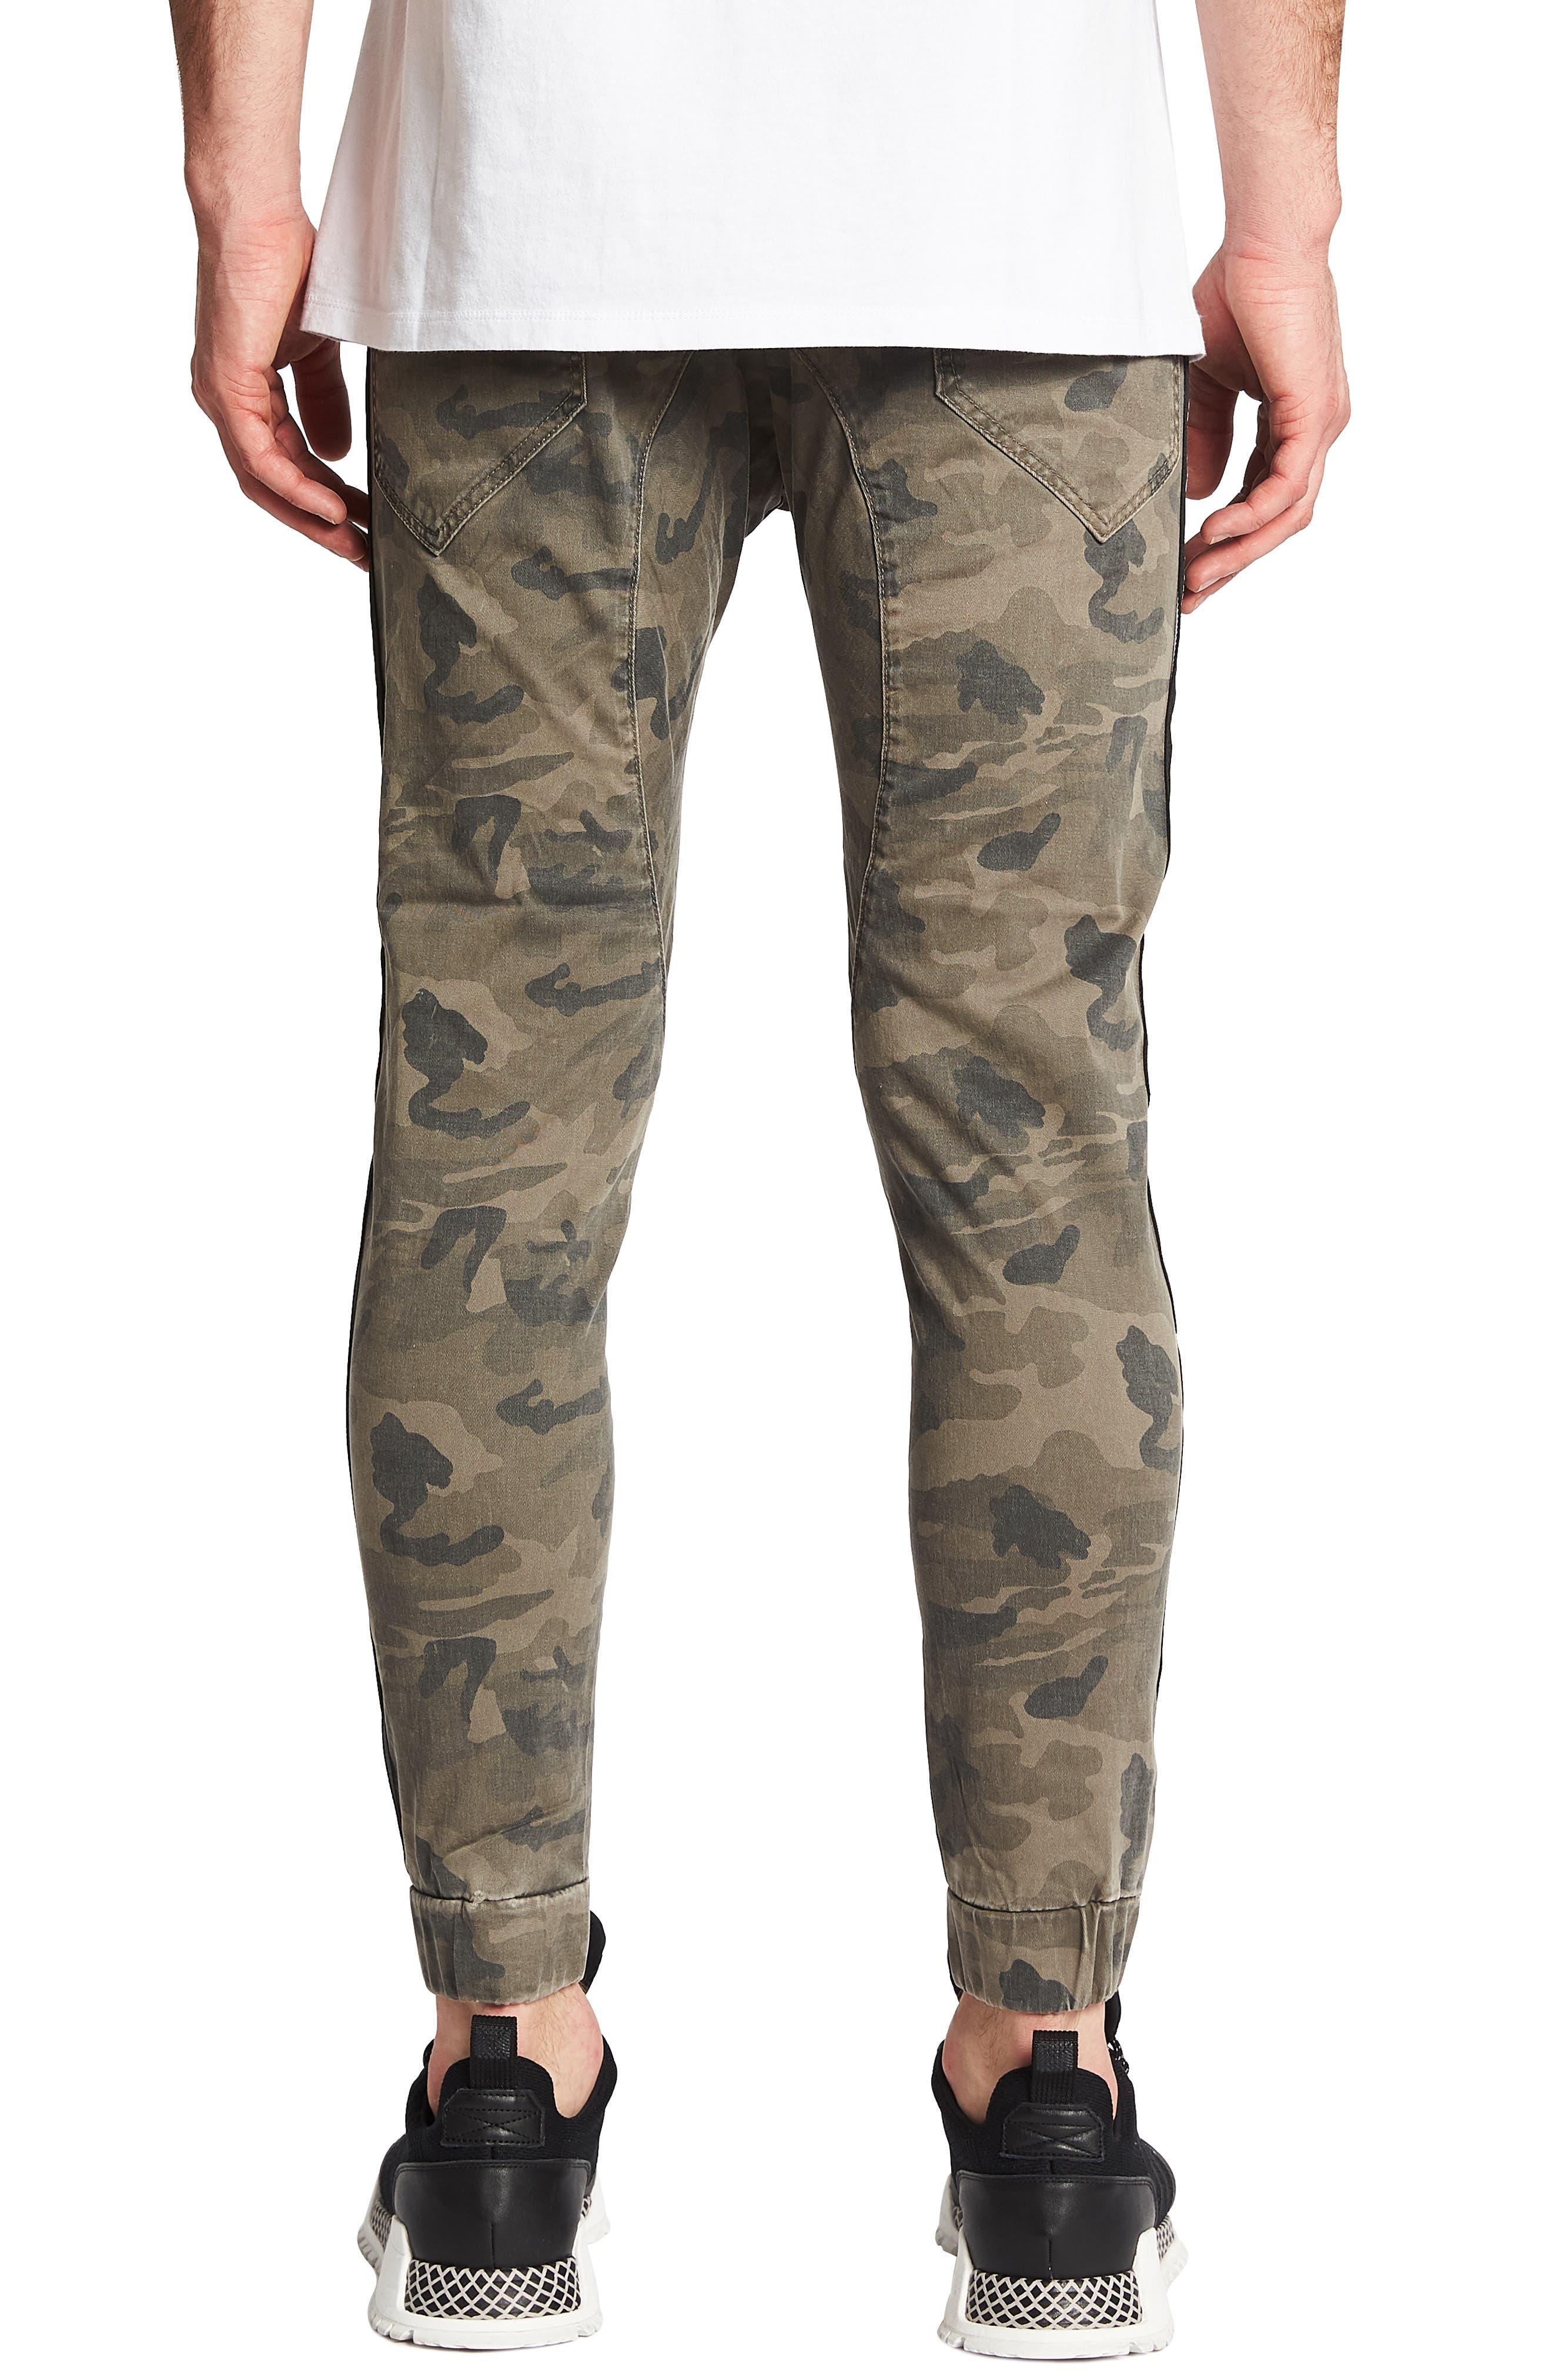 Firebrand Slim Fit Pants,                             Alternate thumbnail 2, color,                             AIRWOLF CAMO